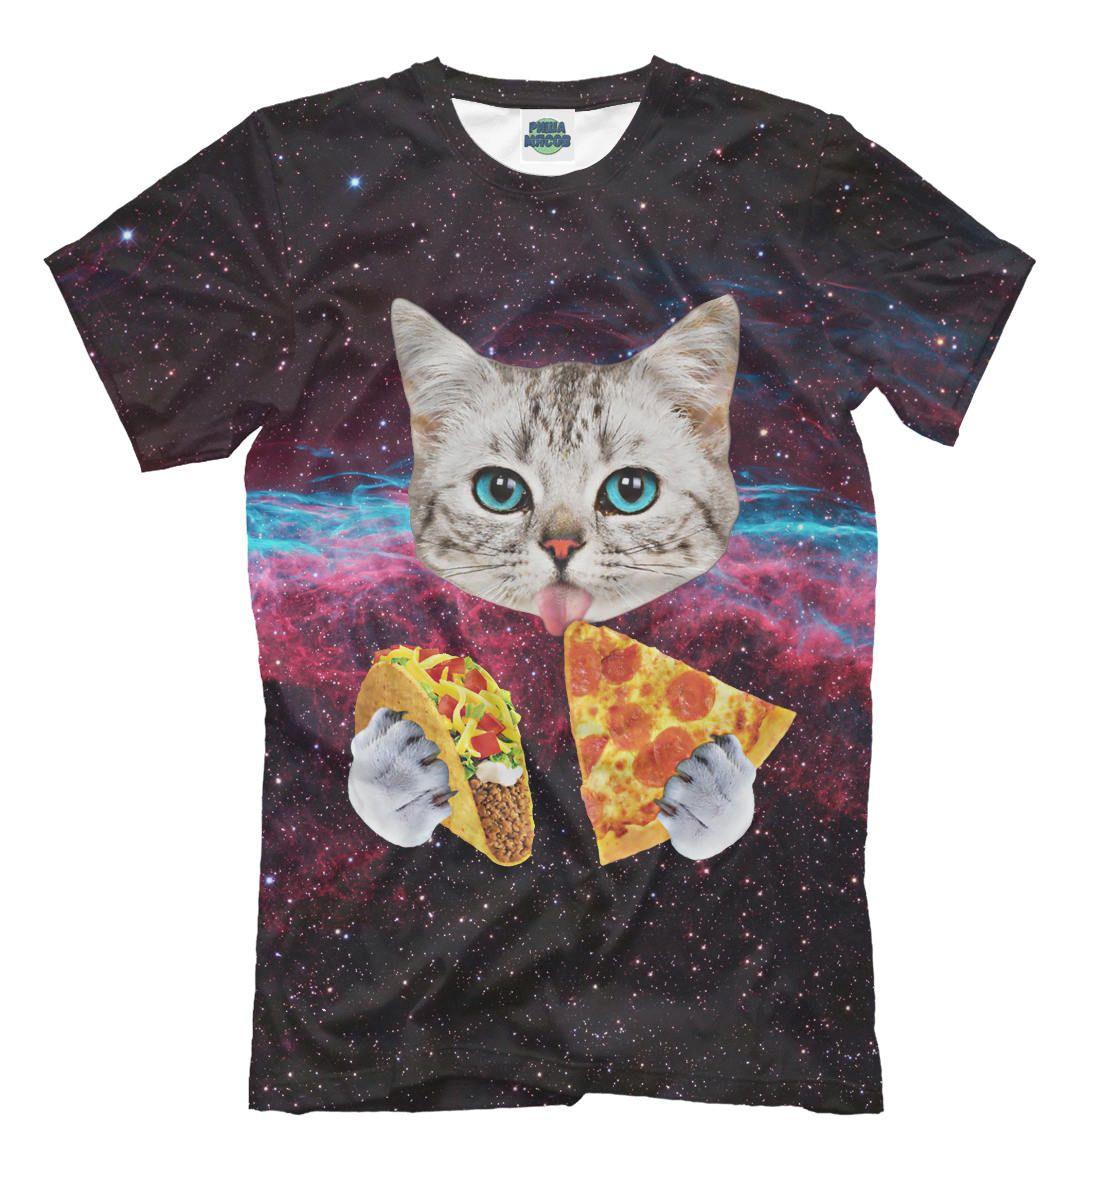 T Shirt Space Cat Cat Cats Cat Tshirt Cat Illustration Tacos Pizza By Rishamyasov On Etsy Cat Shirts Funny Cat Print Space Cat [ 1183 x 1100 Pixel ]